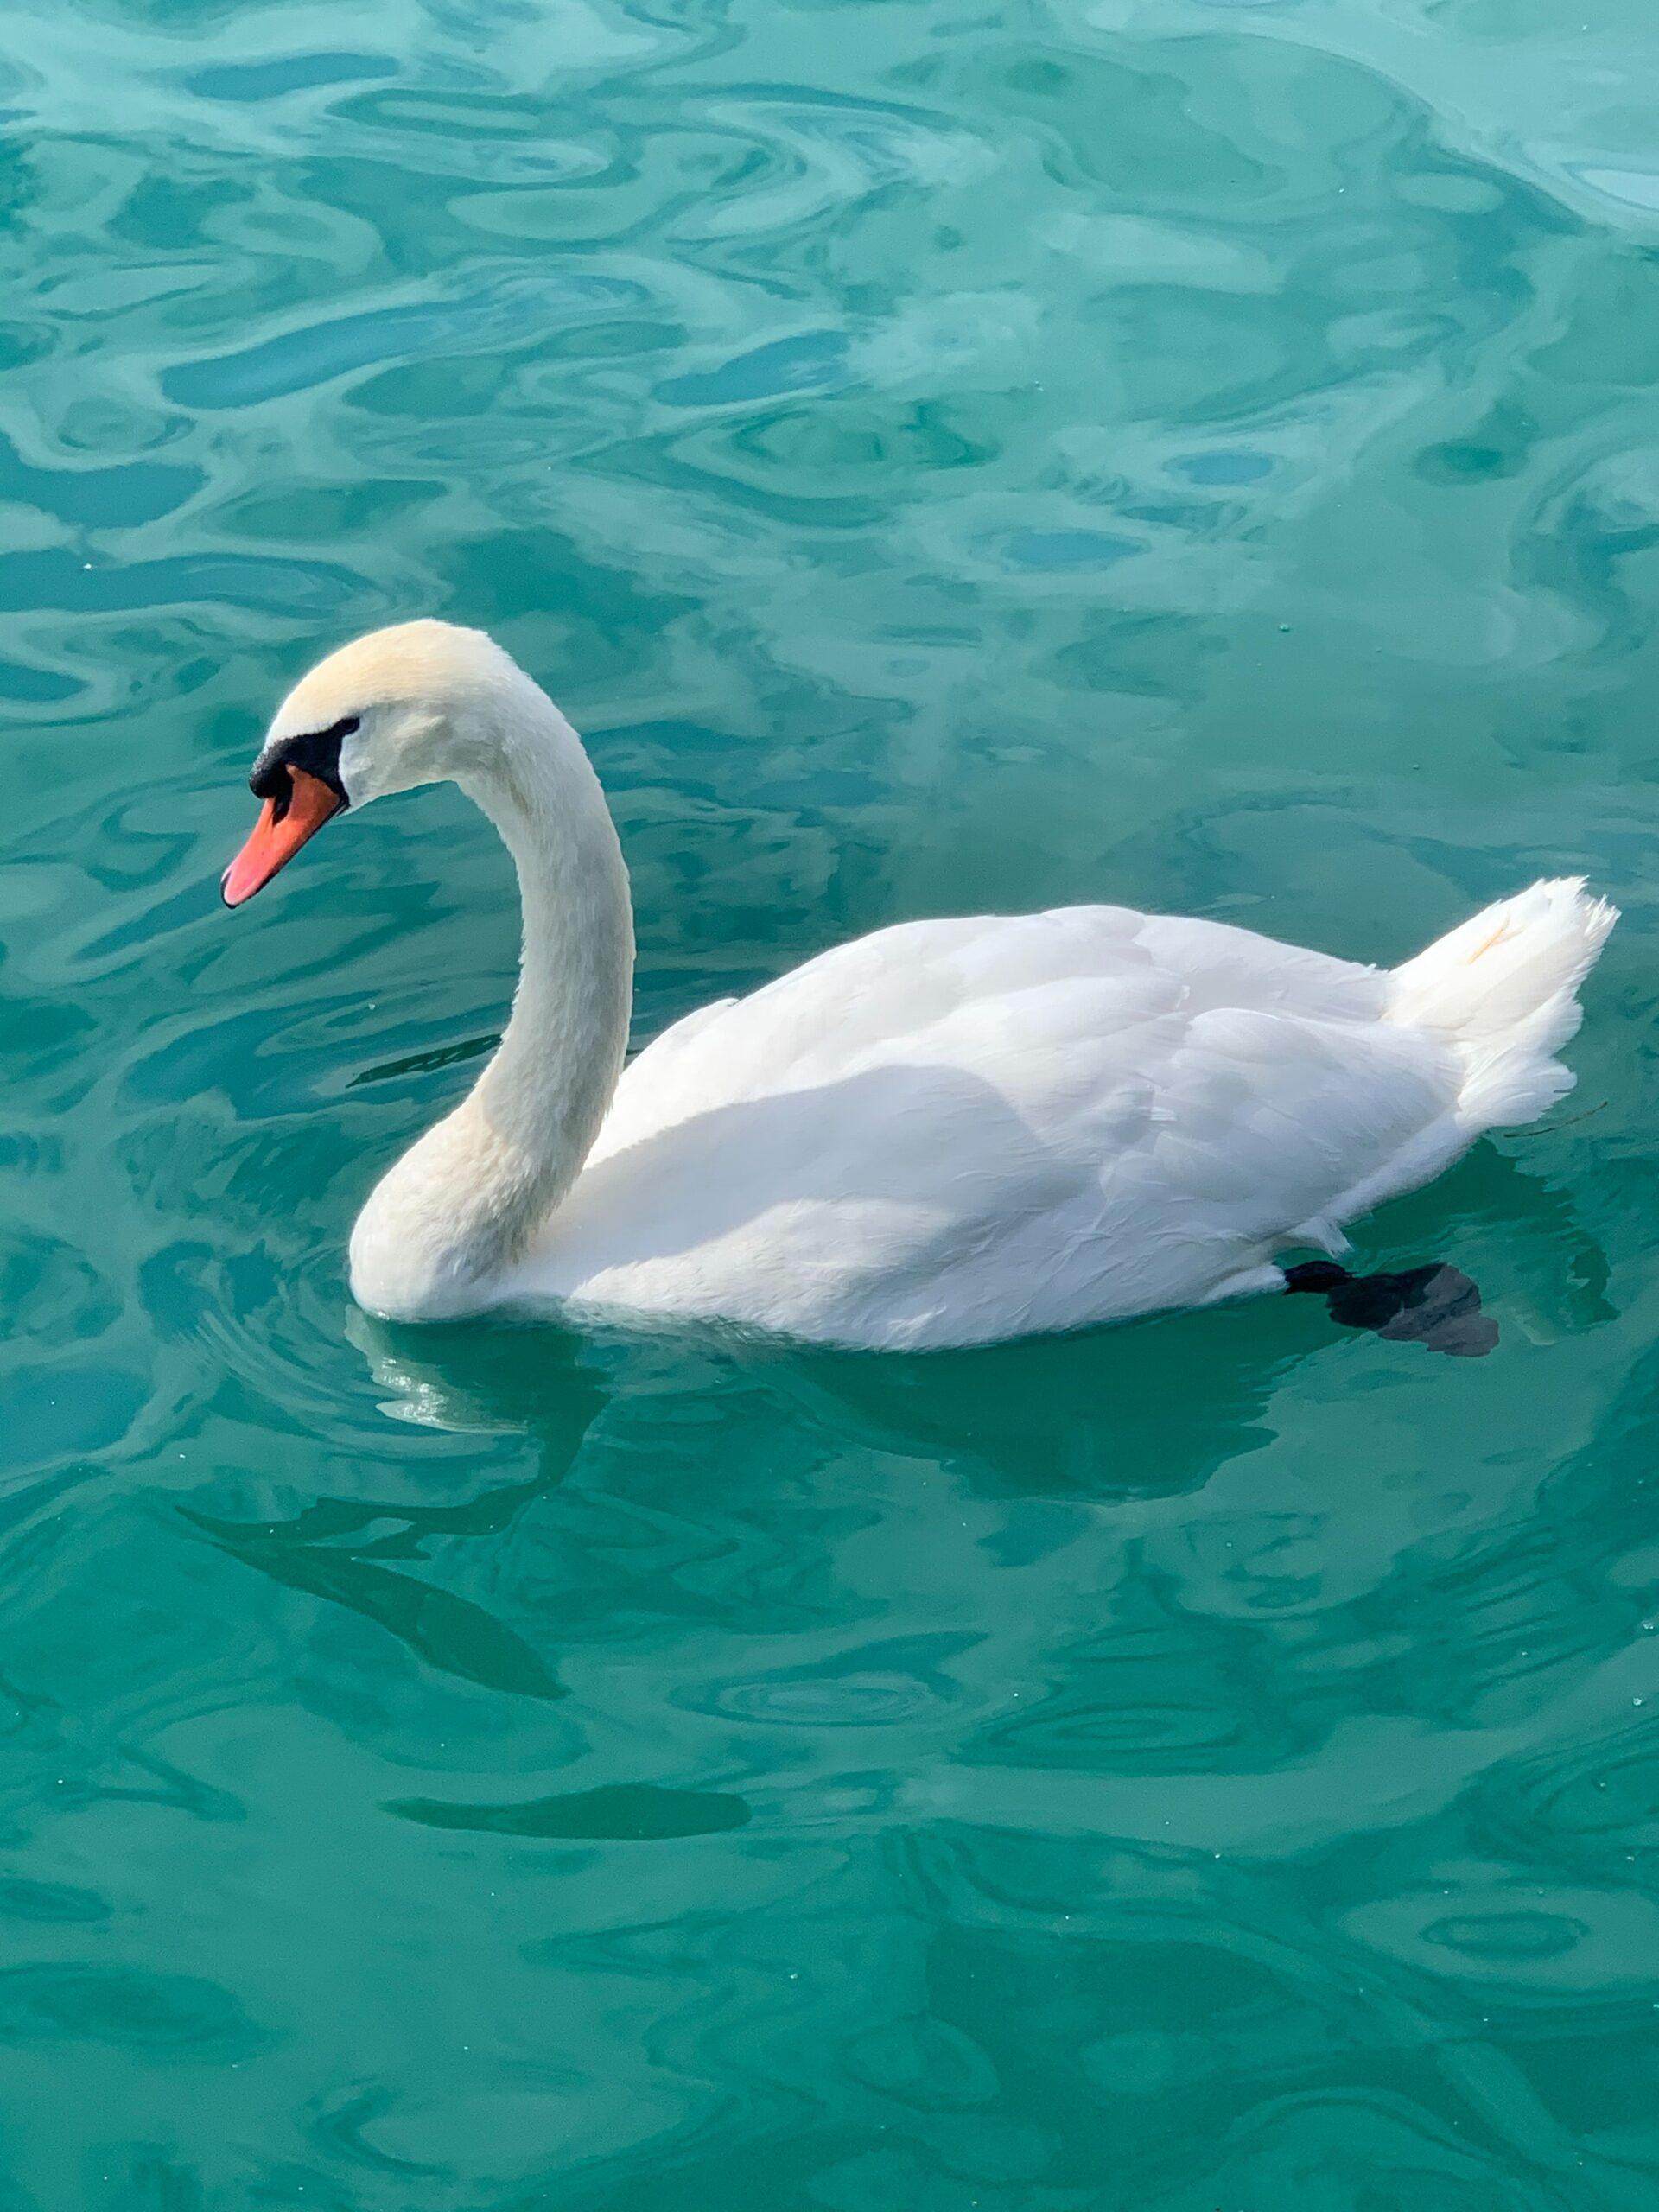 Swan paddling